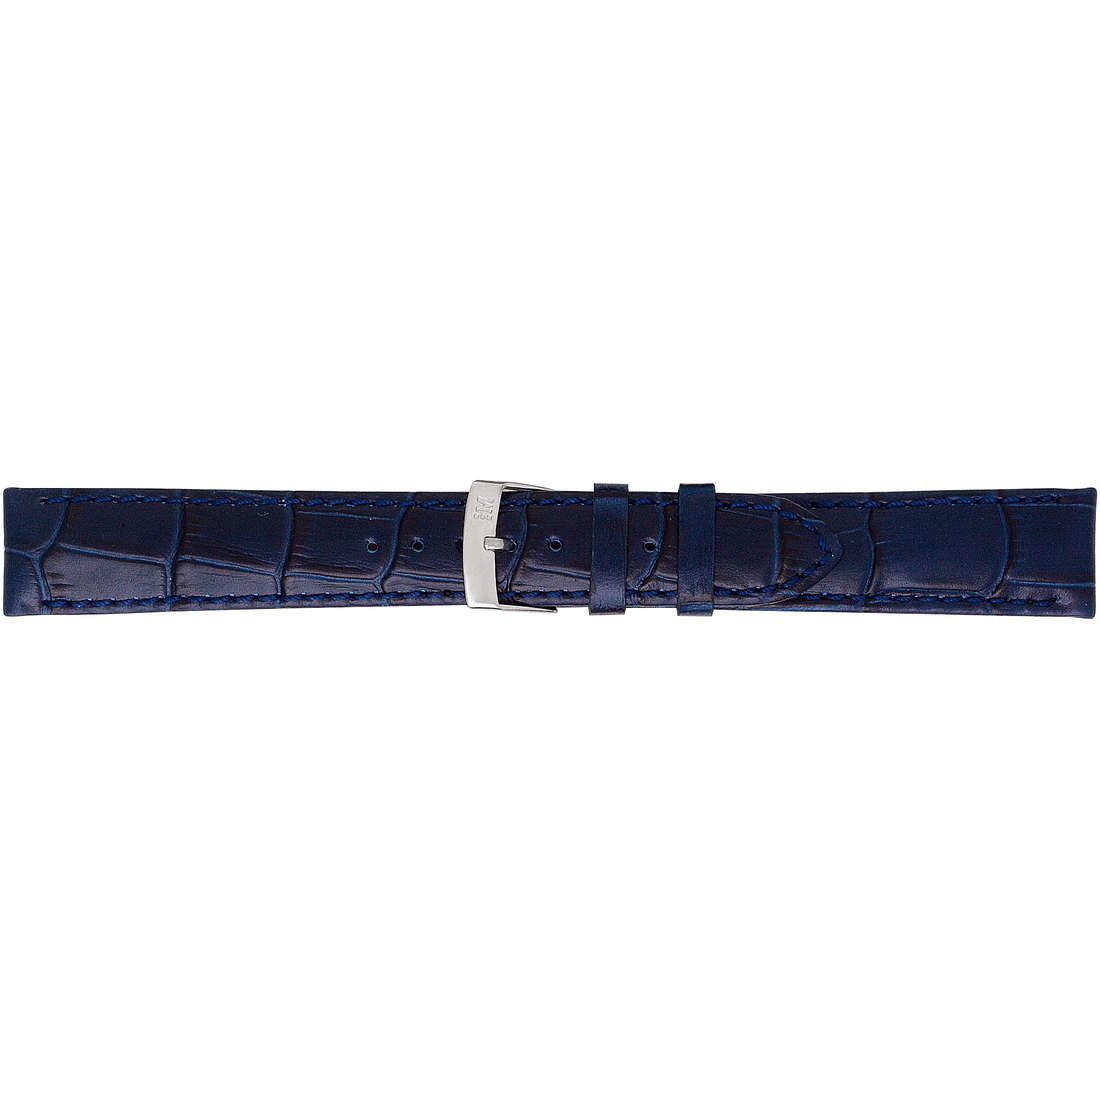 montre bande de montres homme Morellato Performance A01X2704656062CR20